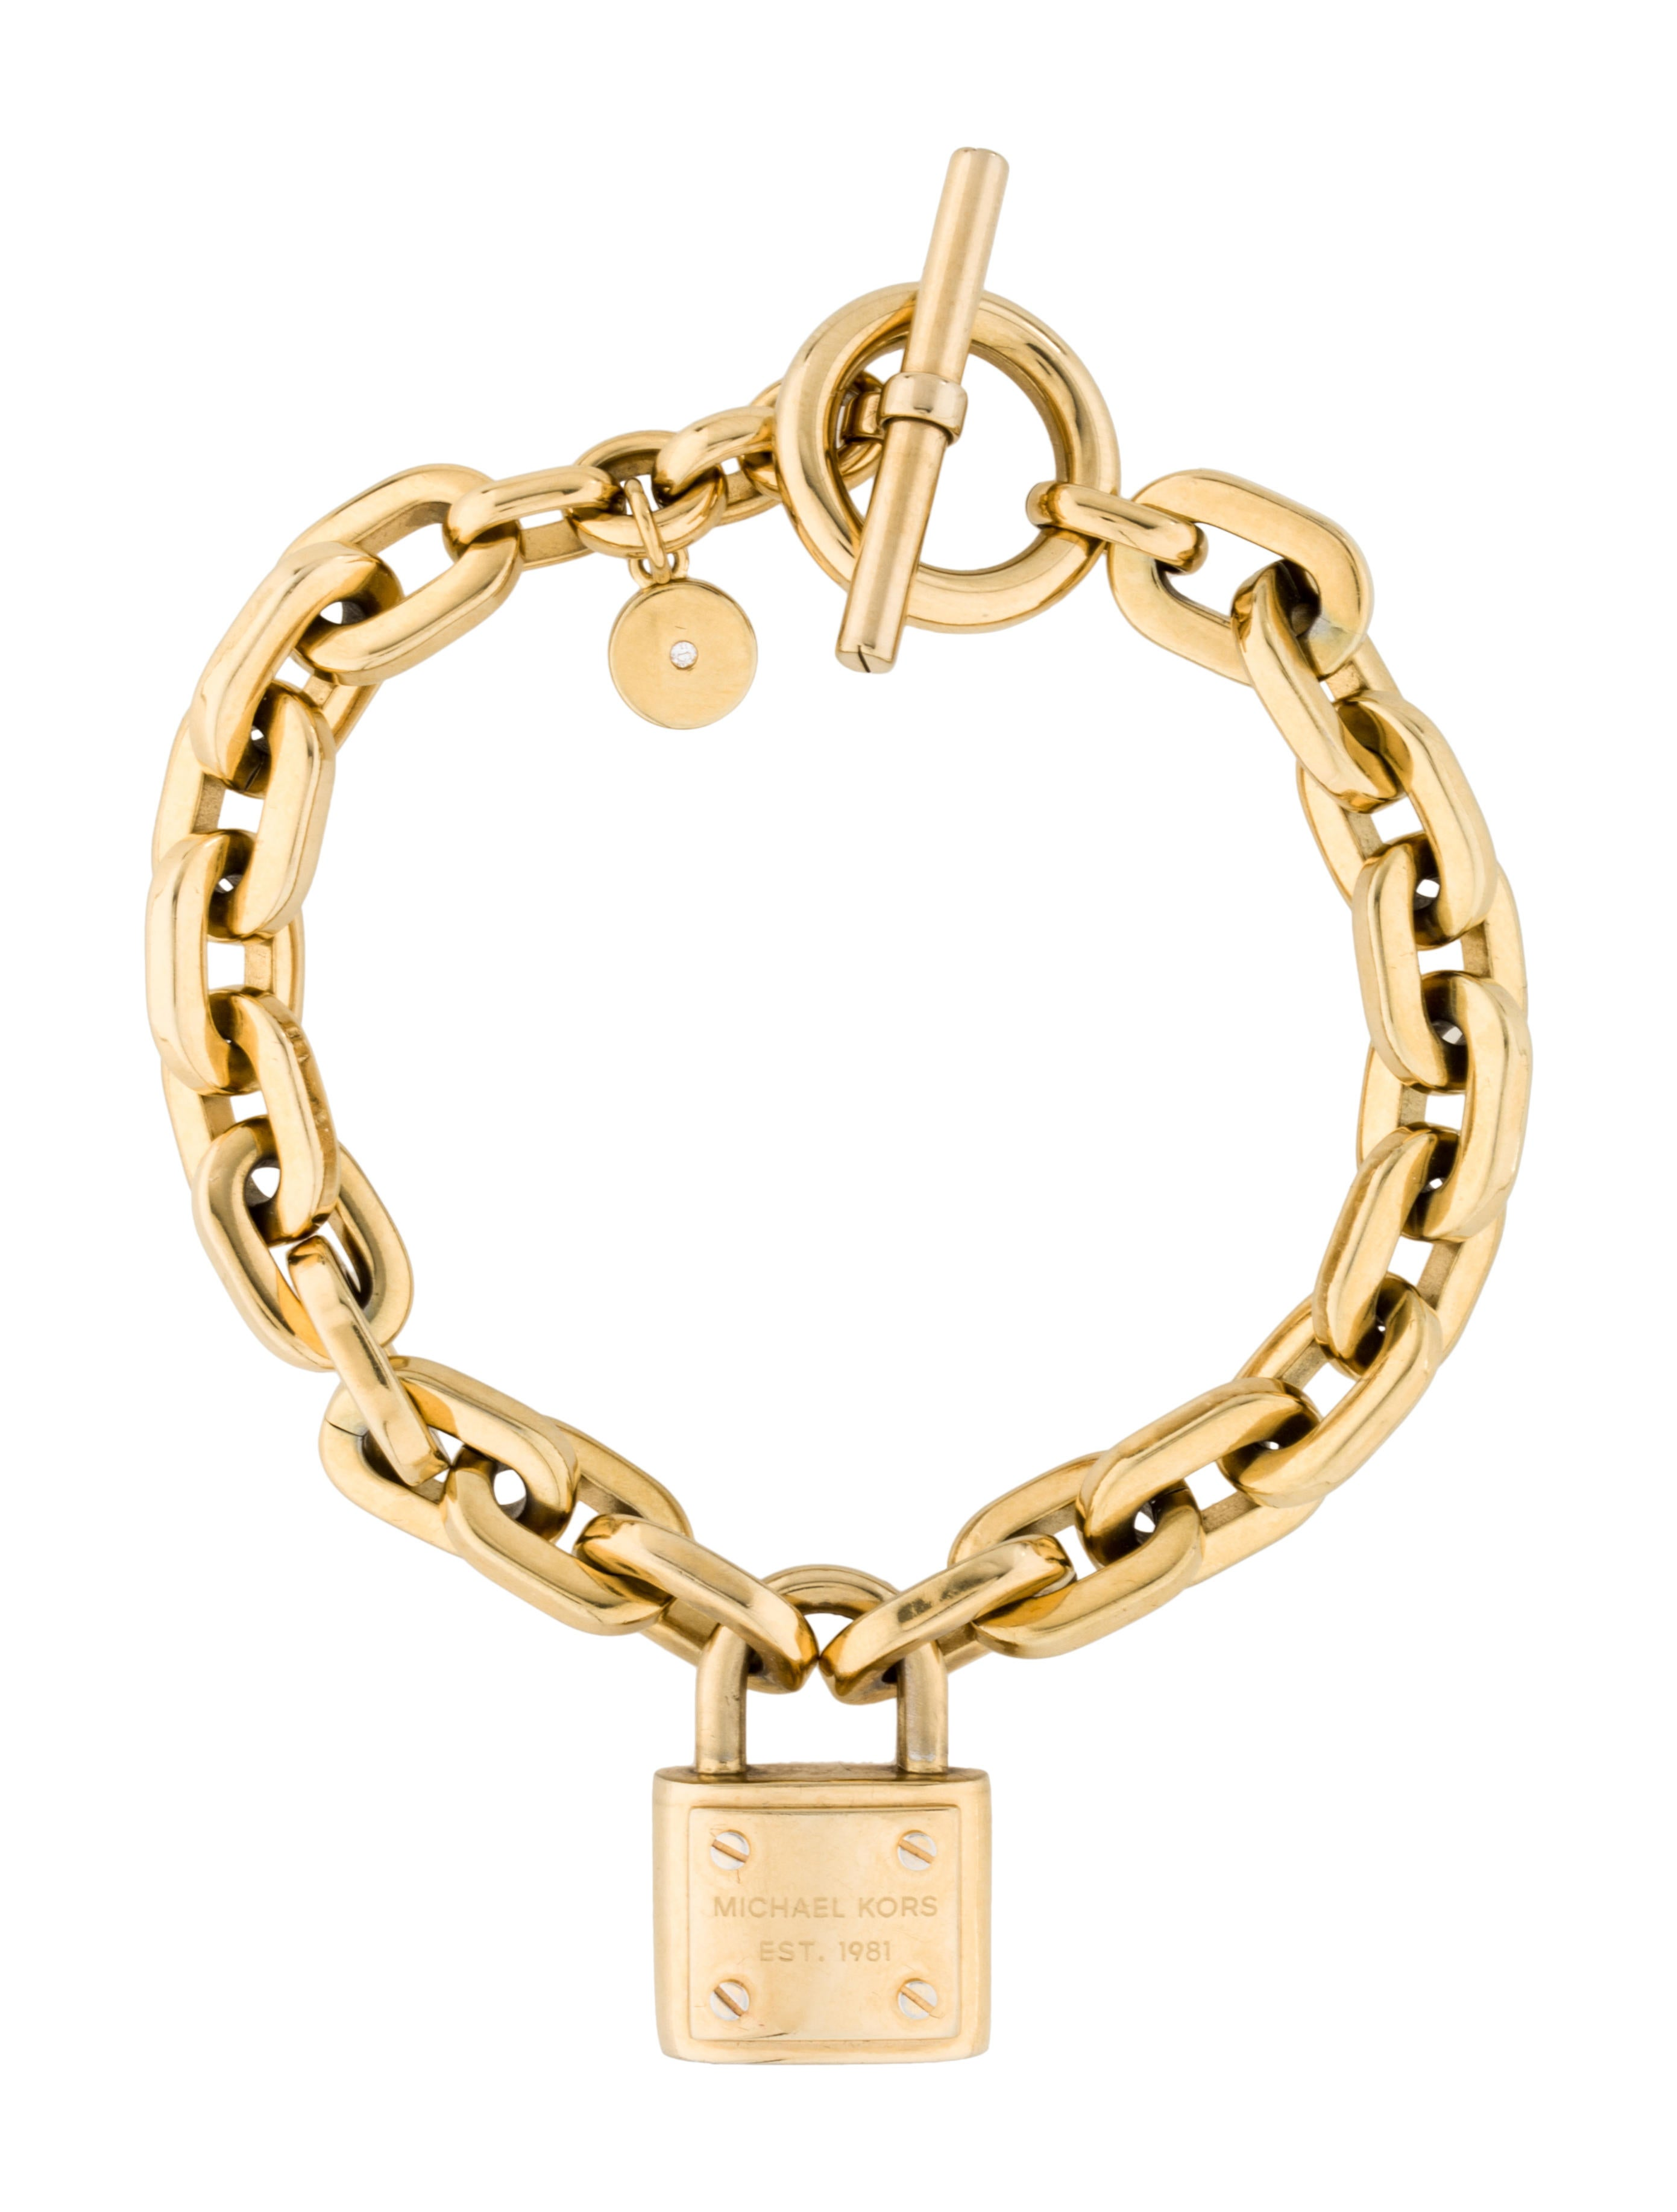 michael kors lock bracelet bracelets mic34824 the